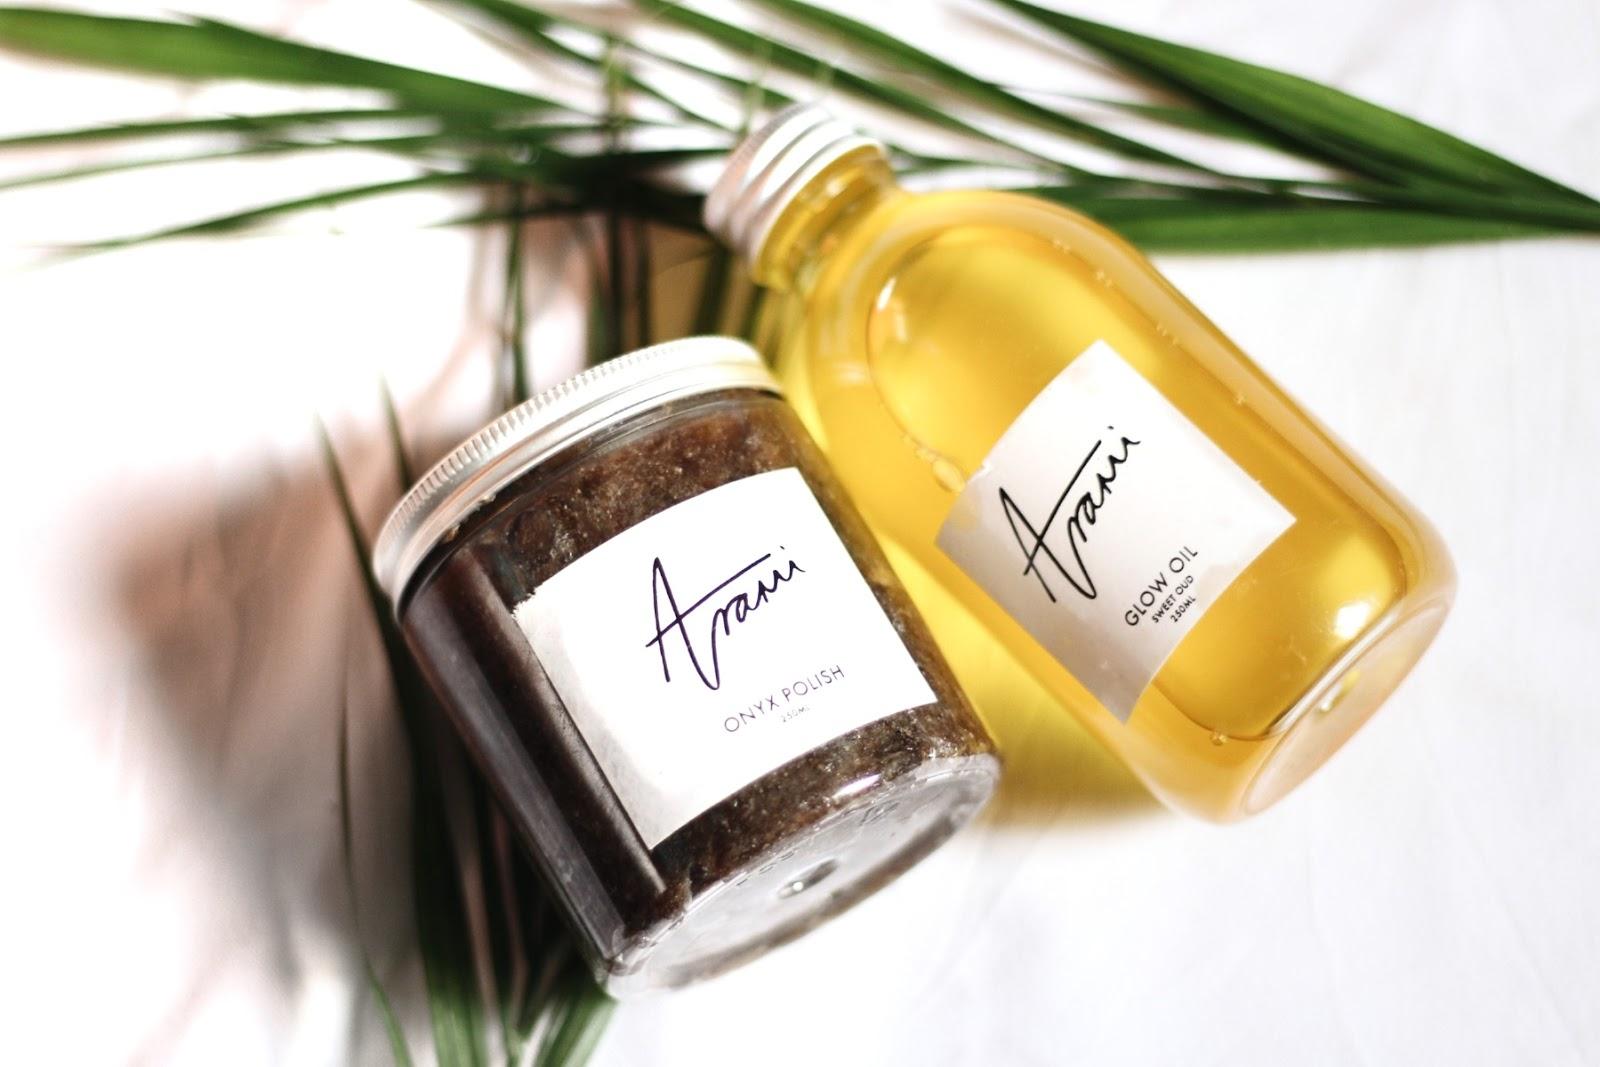 Arami Essentials, Made in Nigeria skincare brand